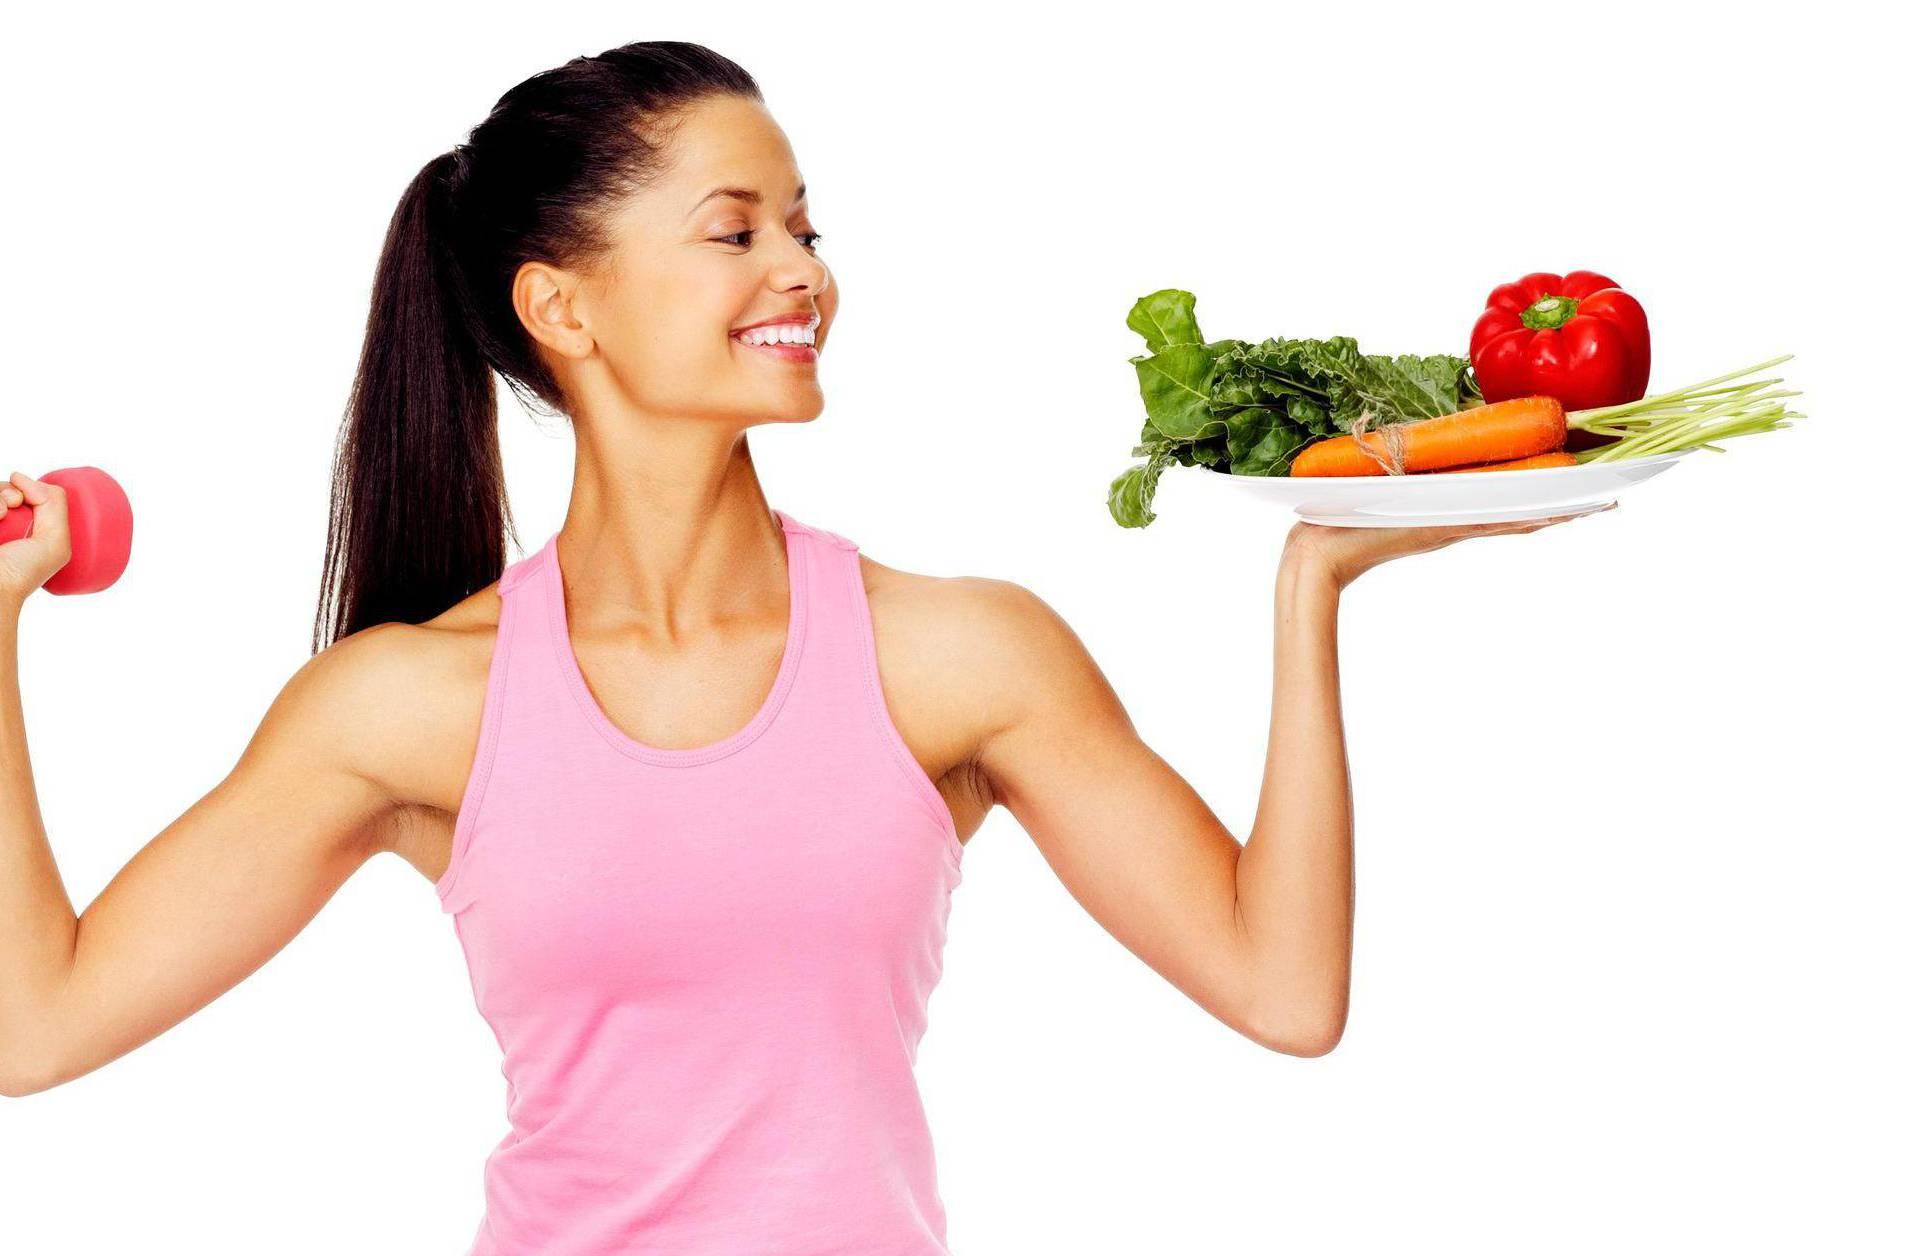 Jedi i otopi salo: Brokula, grah i avokado potiču metabolizam